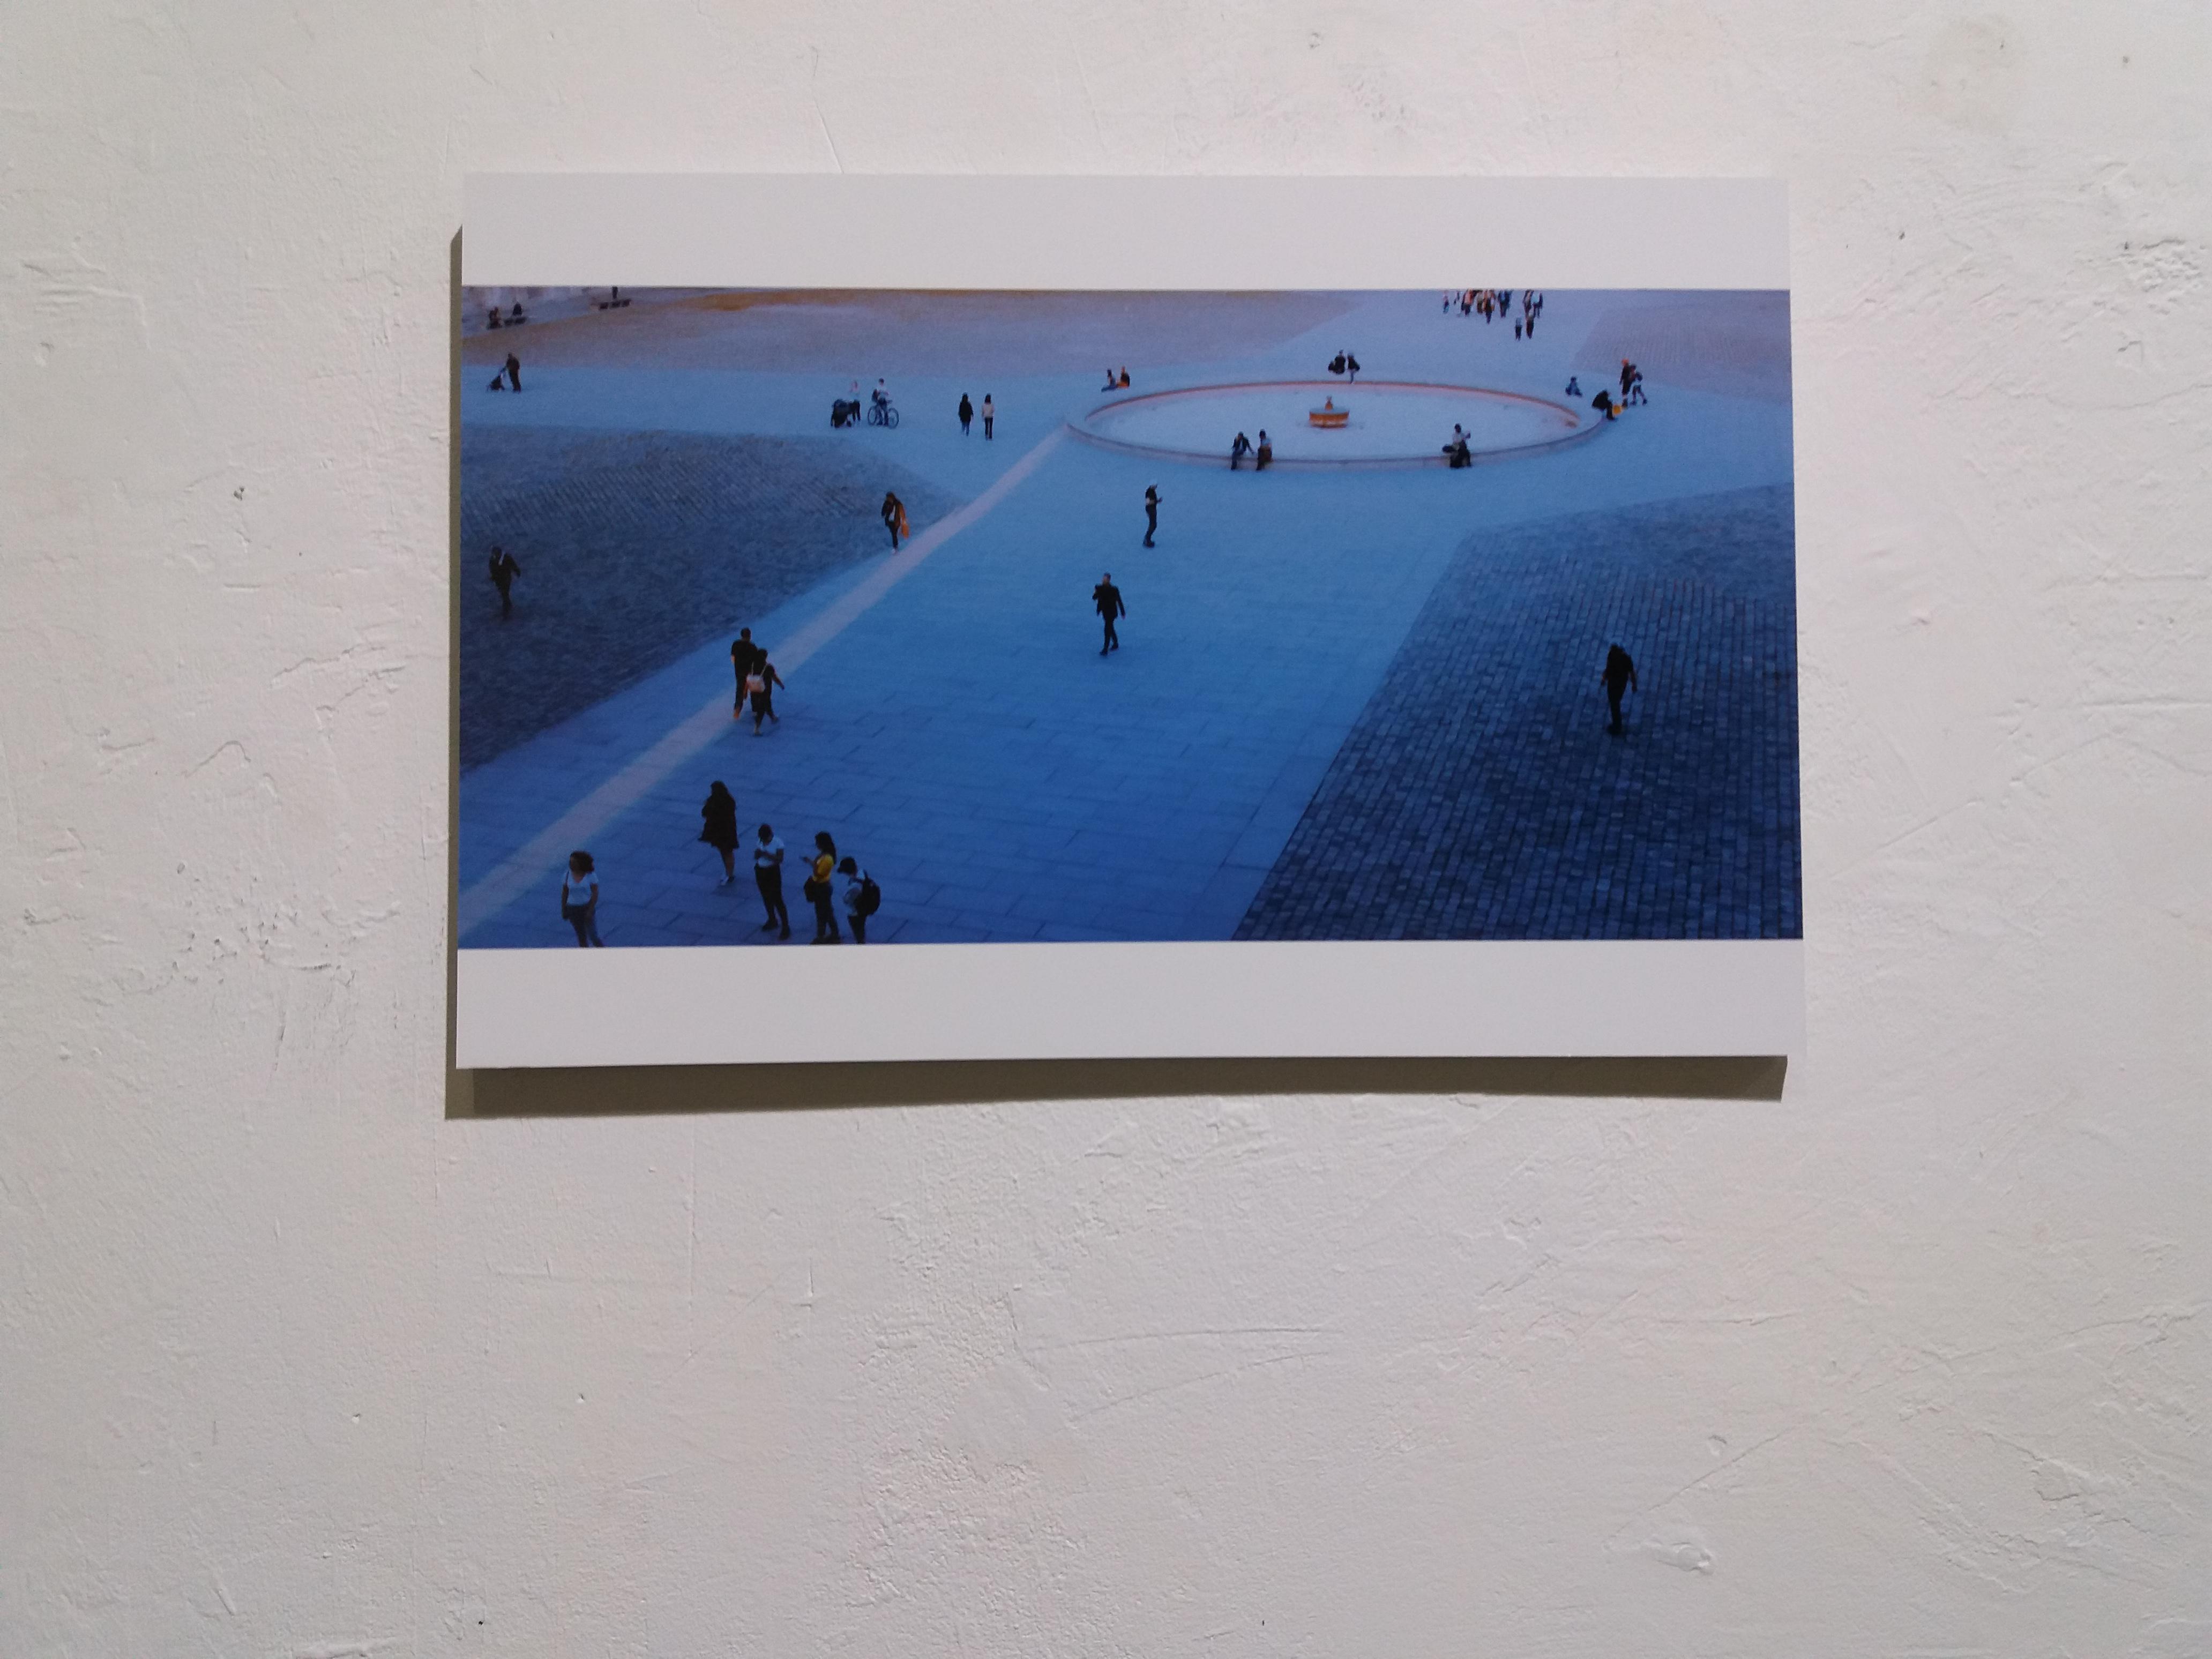 Fotoausstellung als Kunst in Barcelona